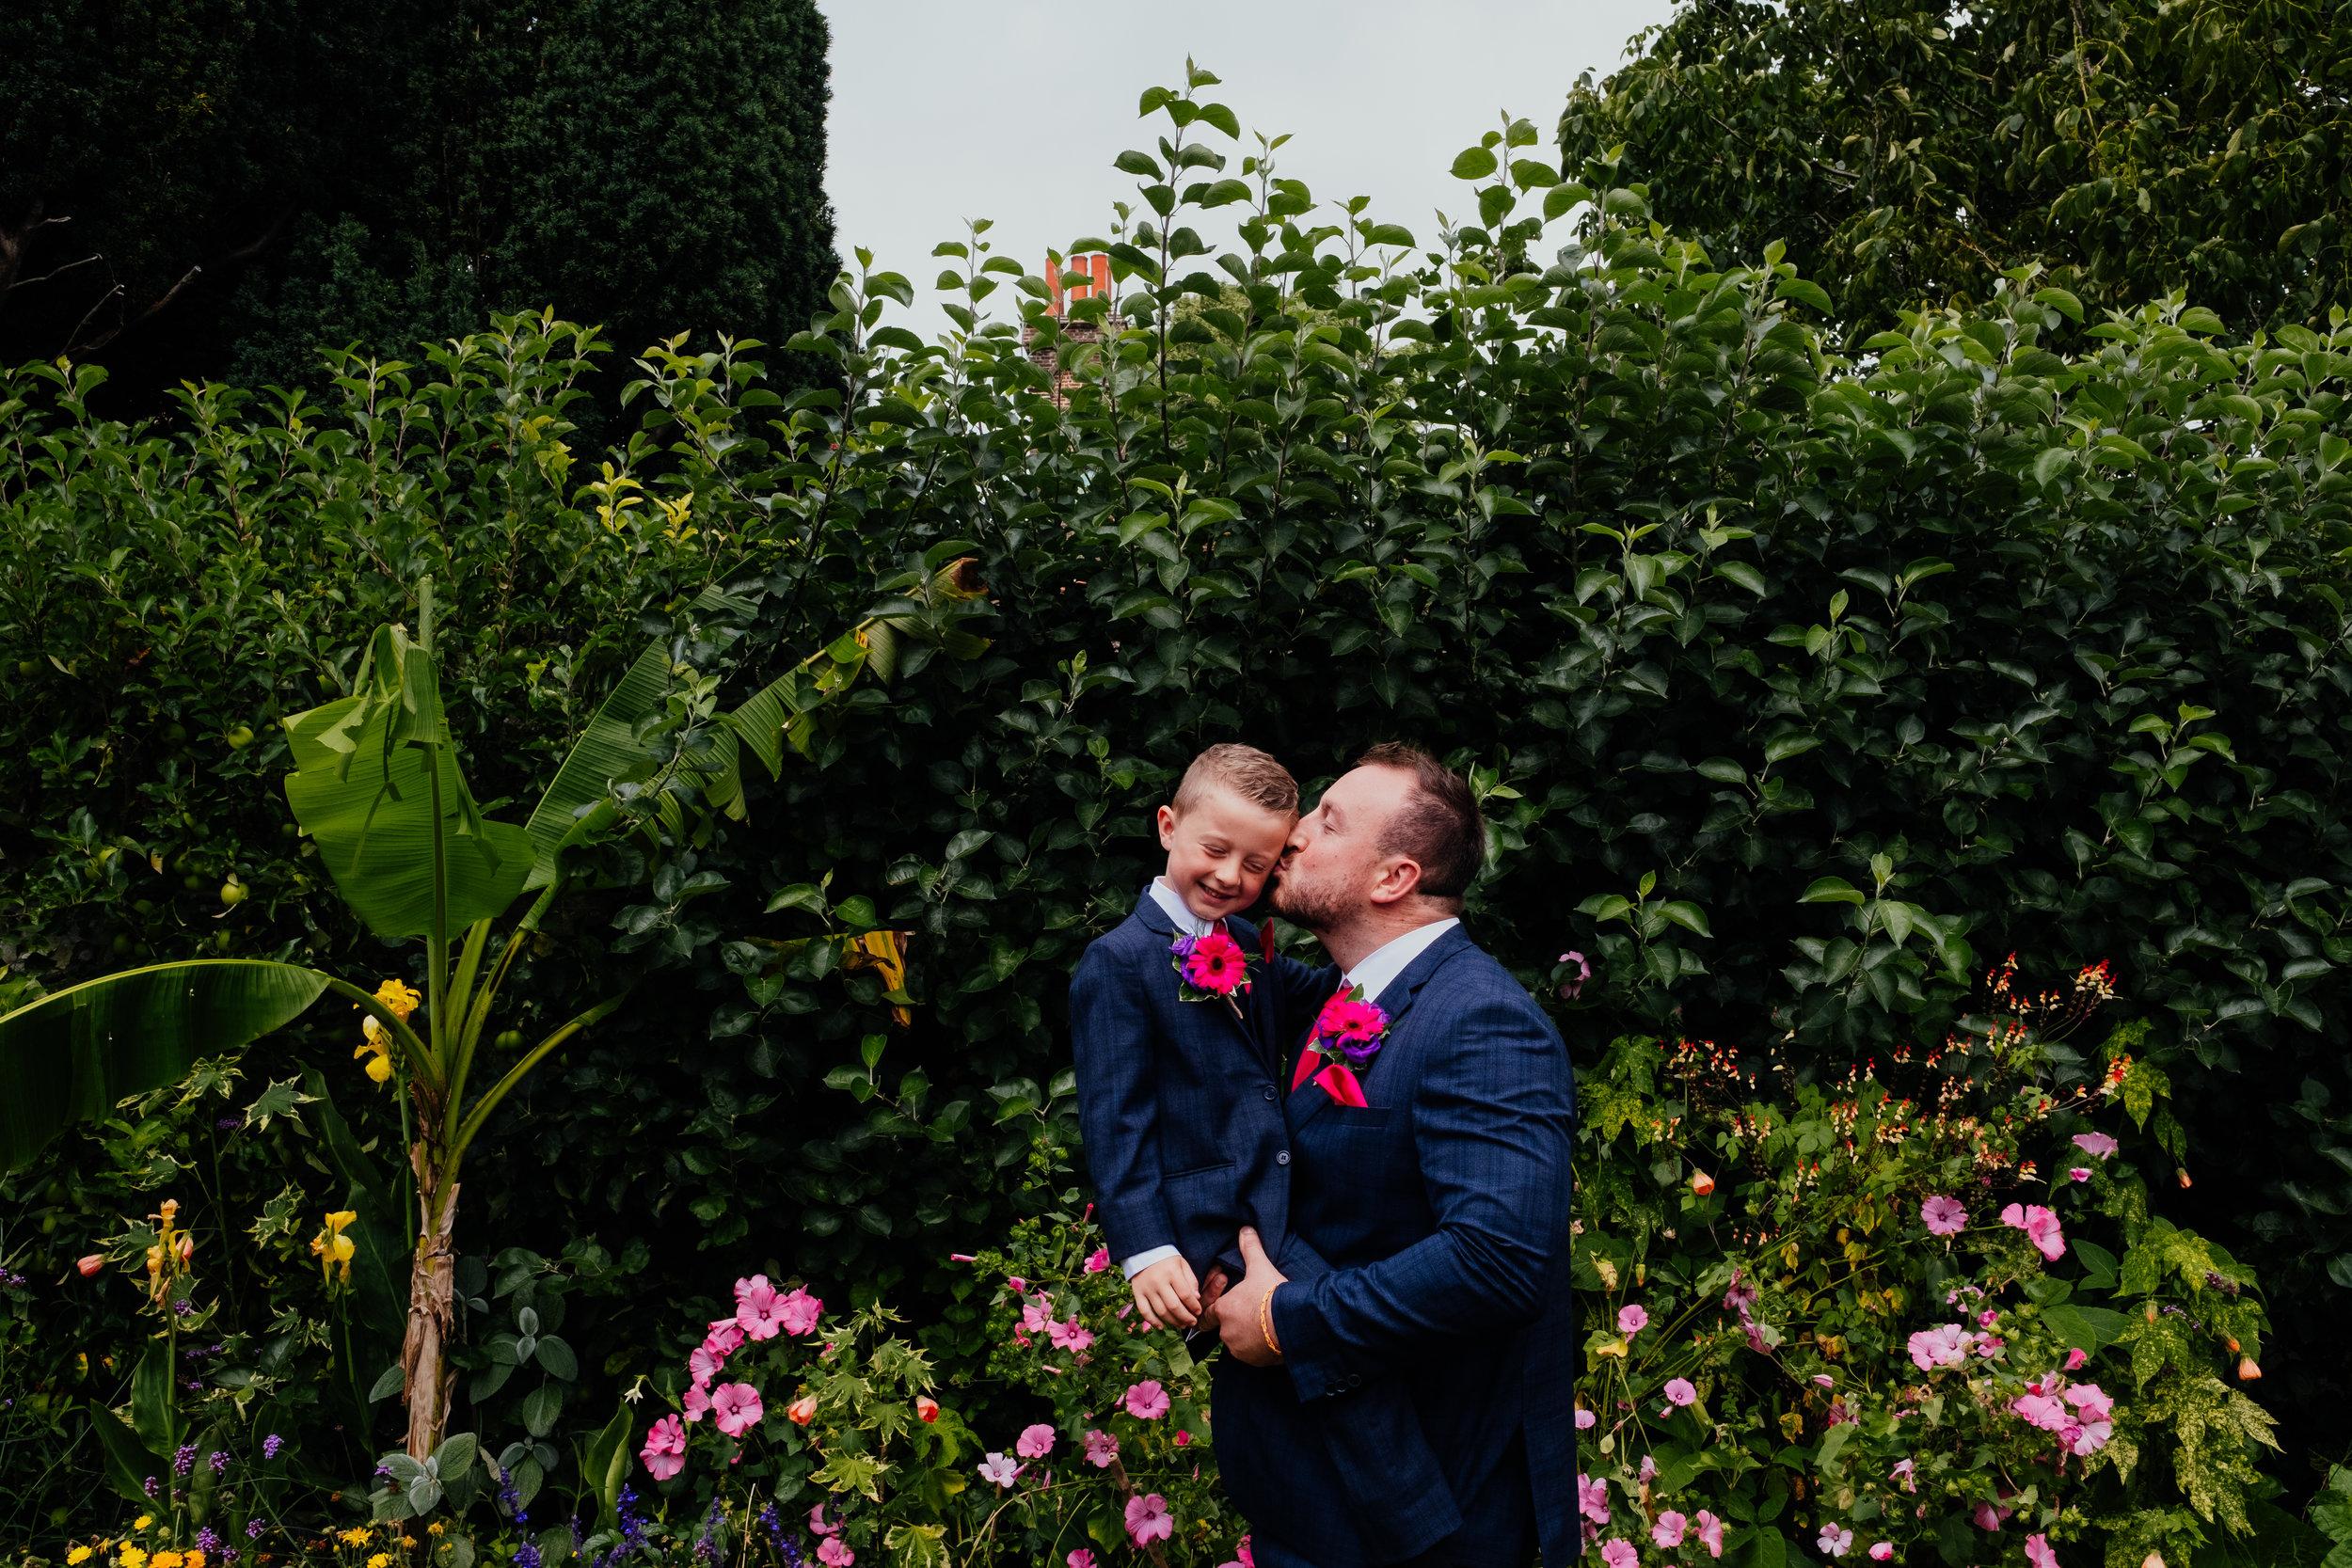 Groom kisses his son on the cheek